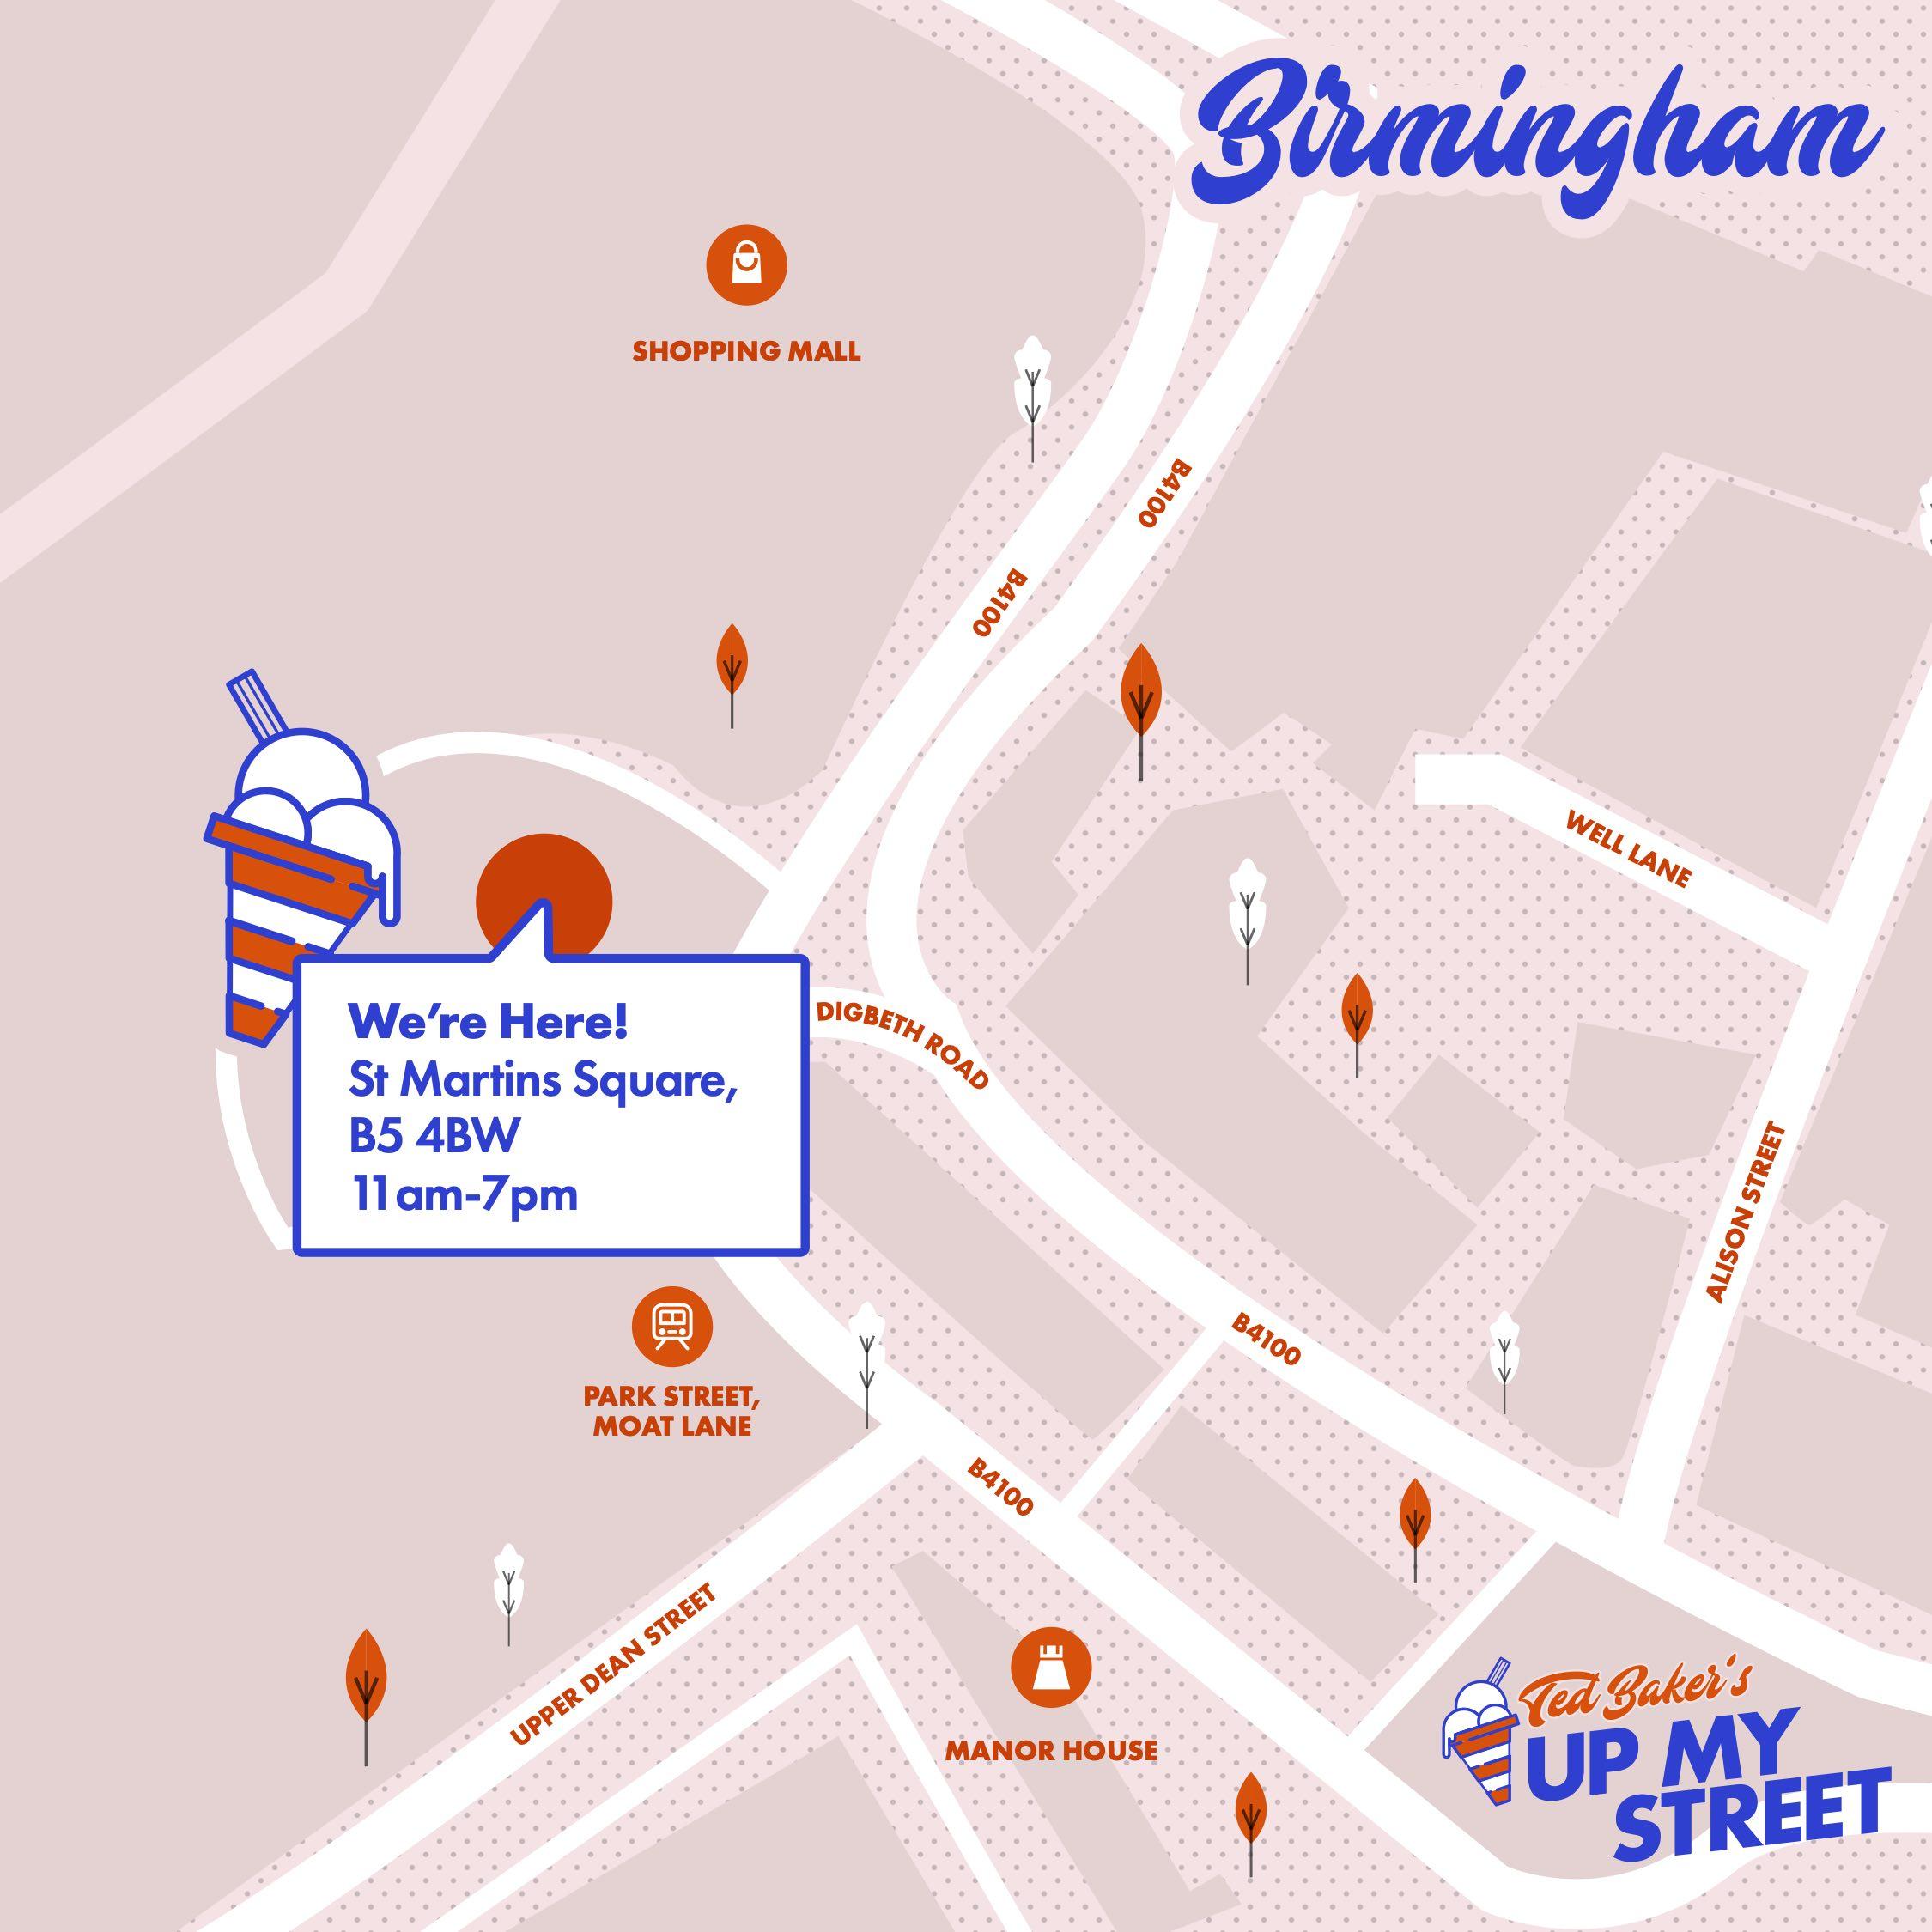 Fancy Free Ice Cream In Birmingham Tomorrow?